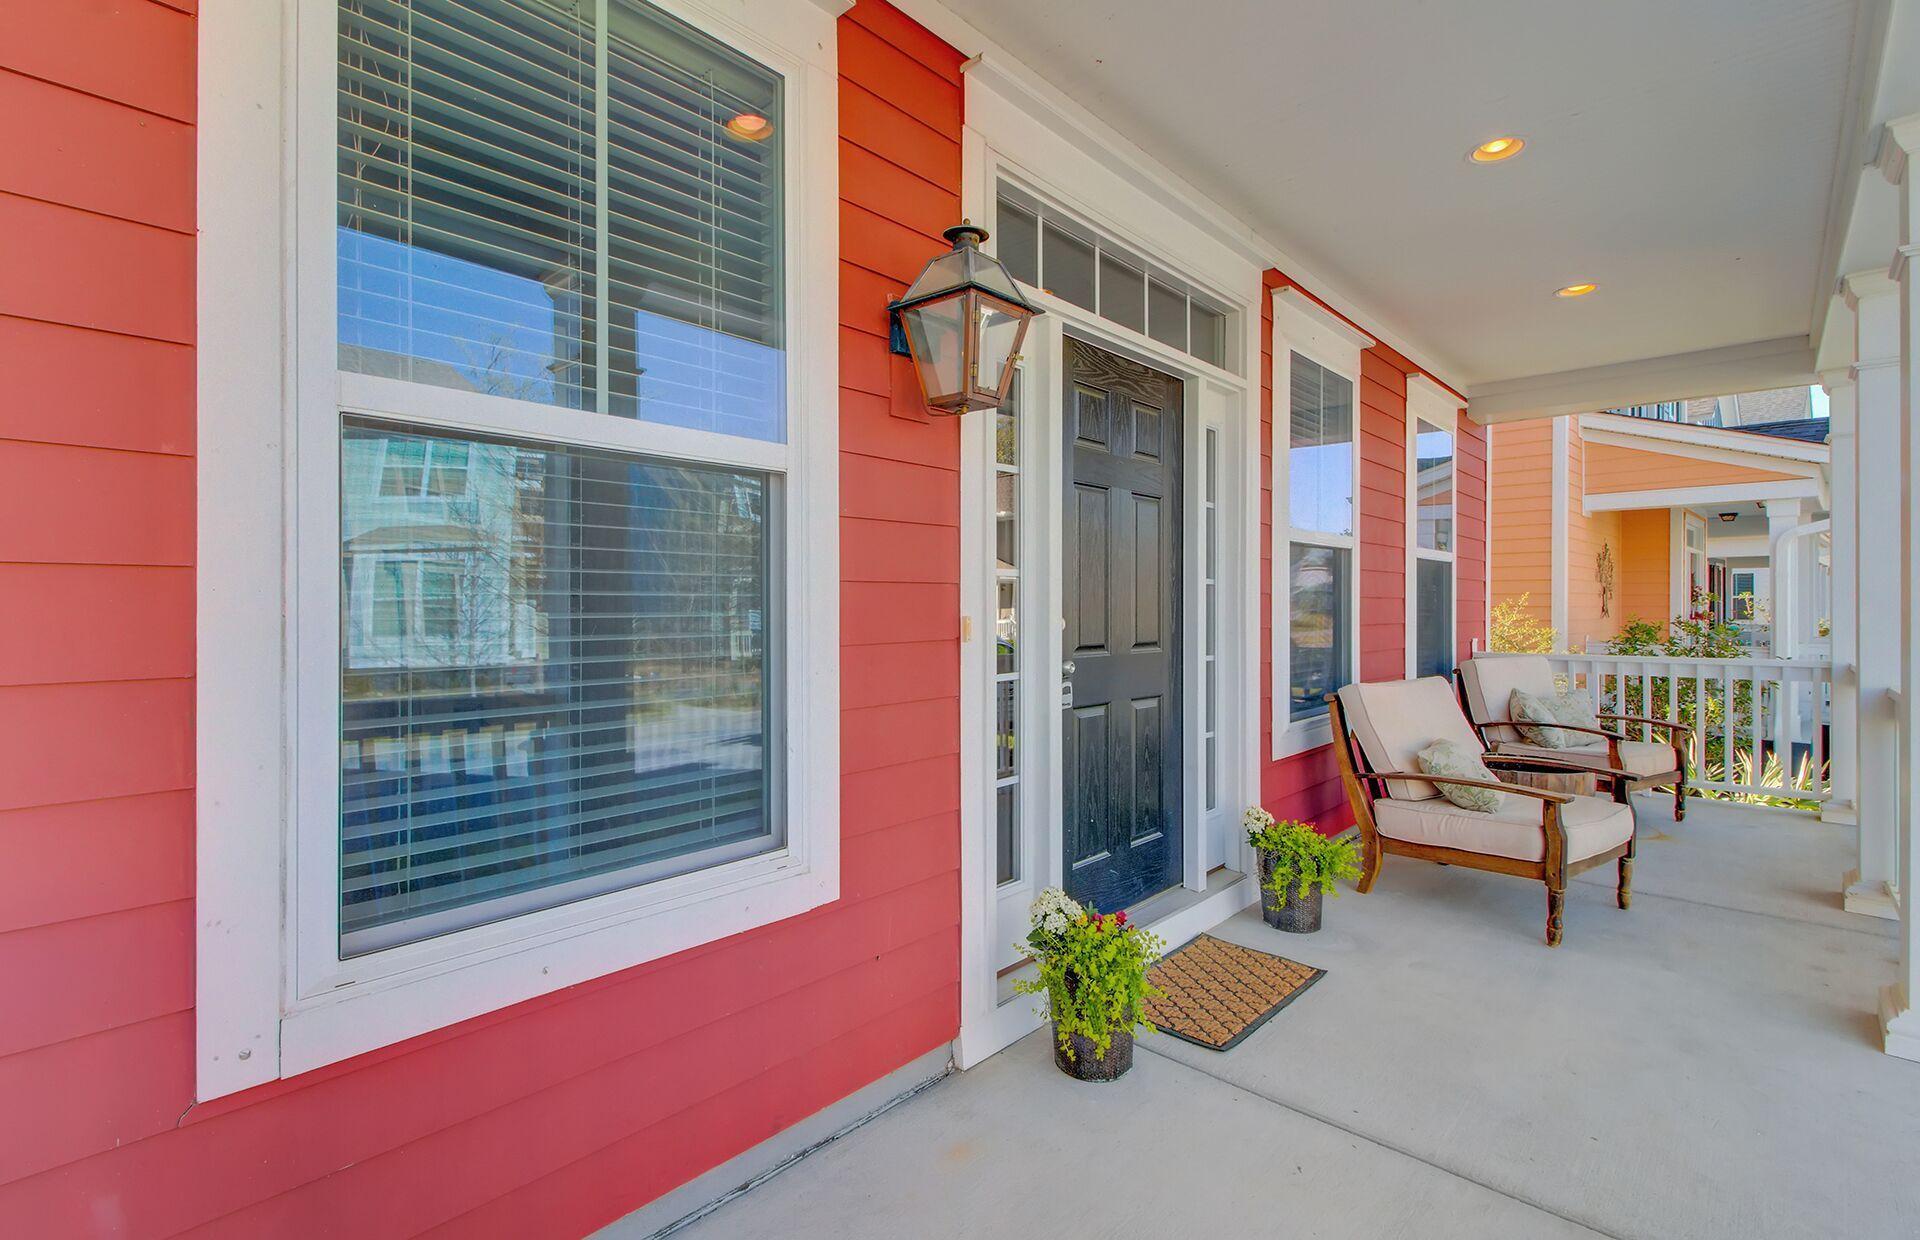 Oak Terrace Preserve Homes For Sale - 4967 Liberty Park, North Charleston, SC - 3